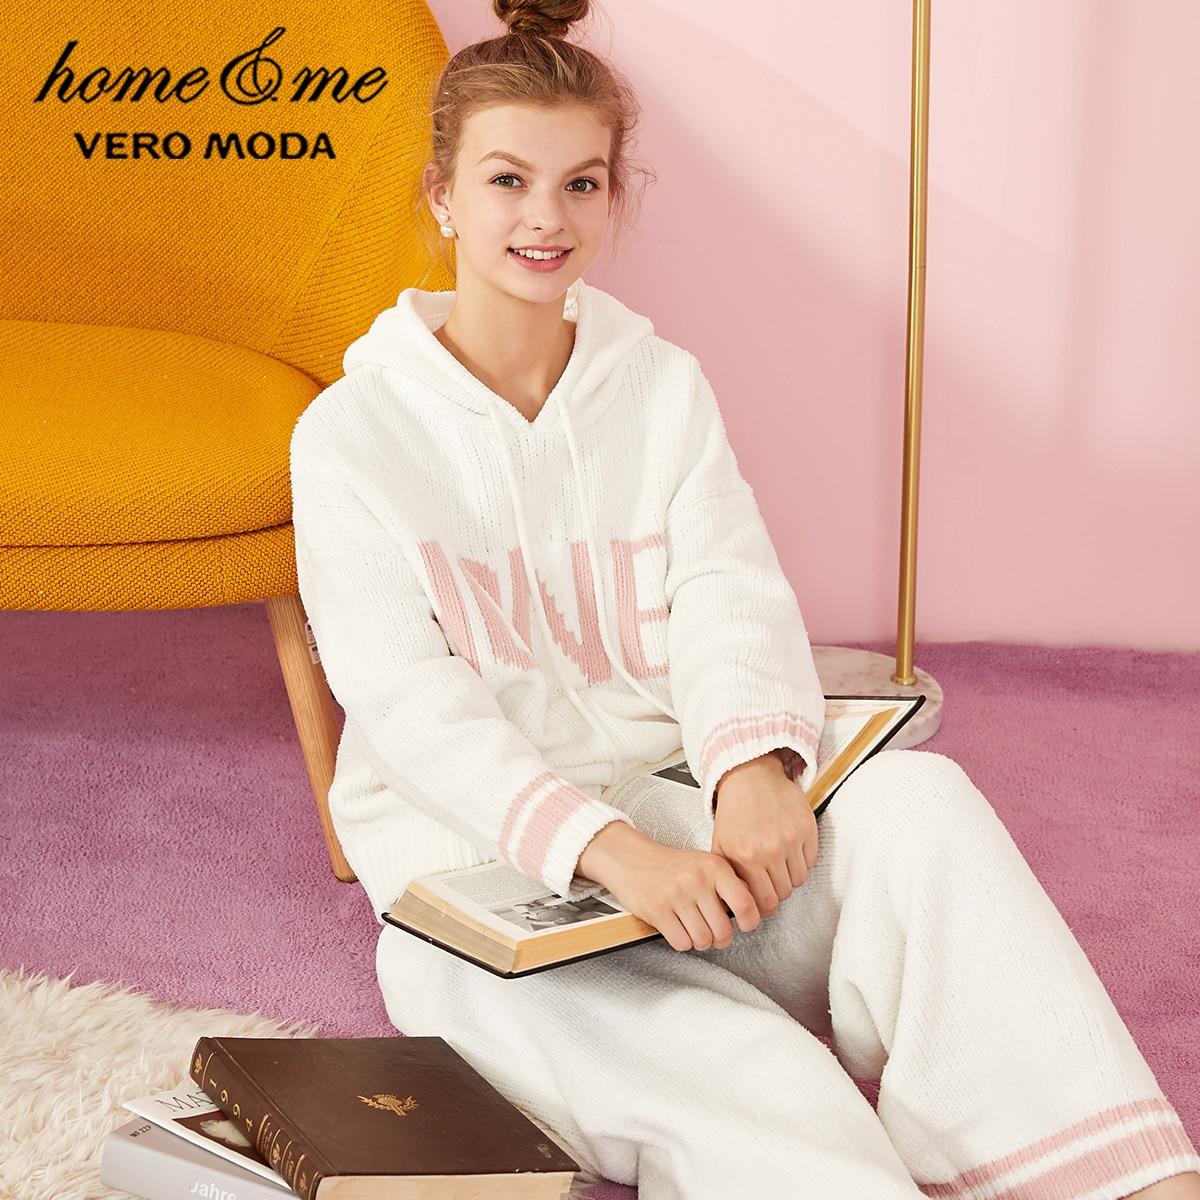 Vero Moda Women's Two-piece Long-sleeved Knitted Sleepwear Pajamas Sets | 3194K6506